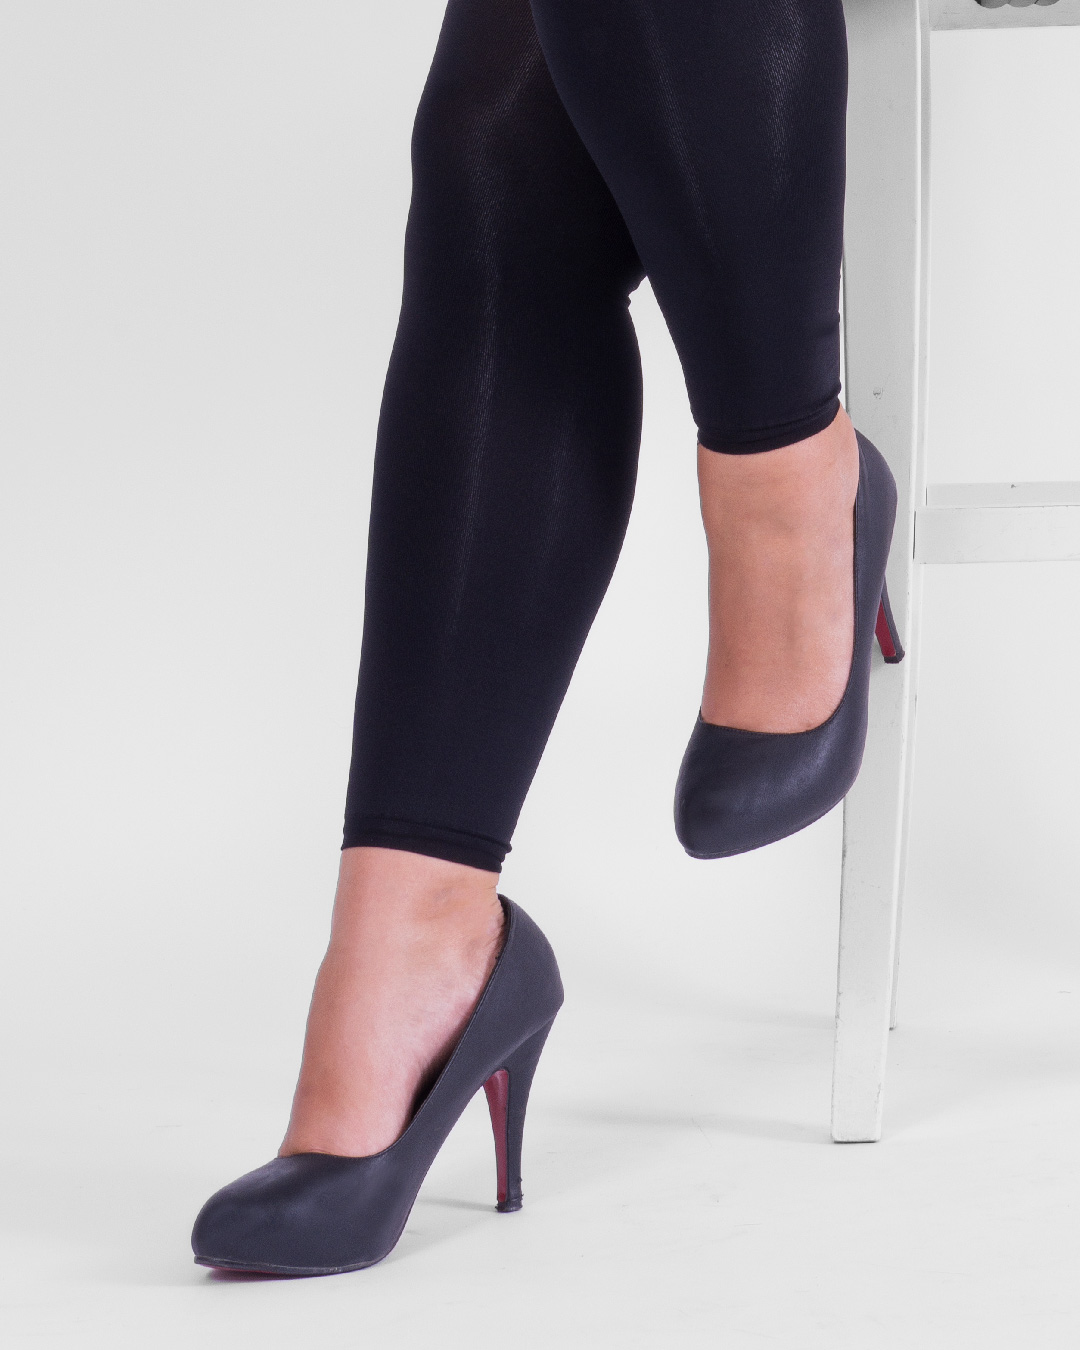 personalsize-exclusive-leggings-exclusive-prd_002.jpg